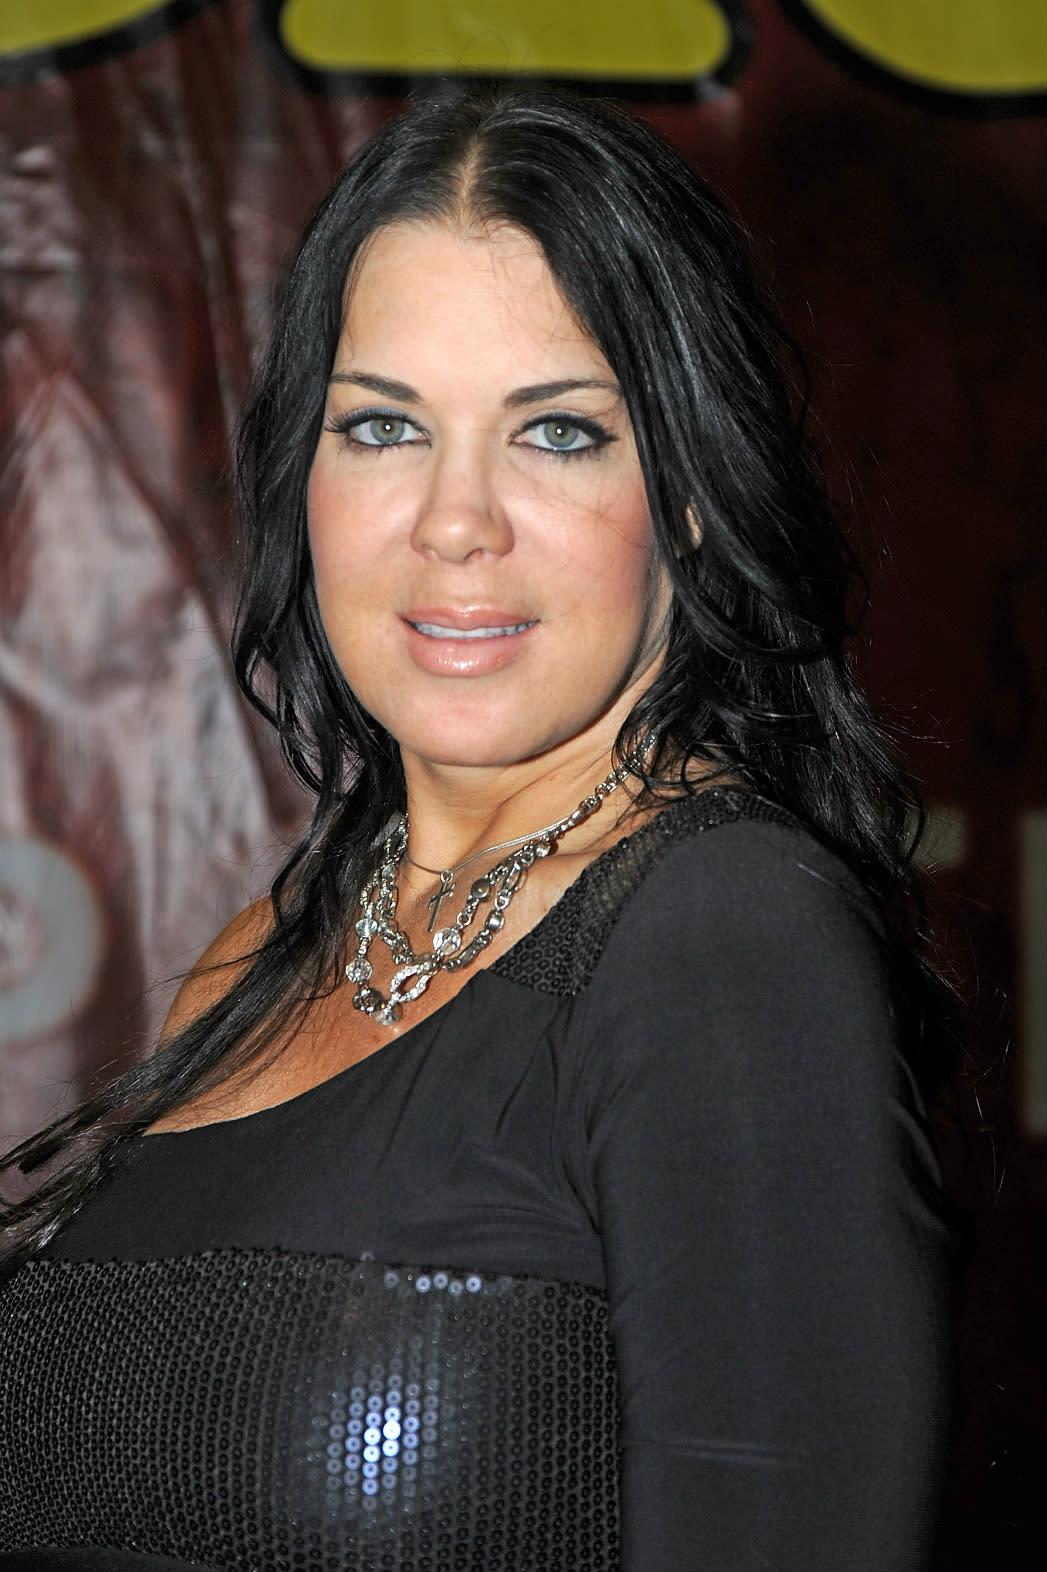 Johanna Lundback